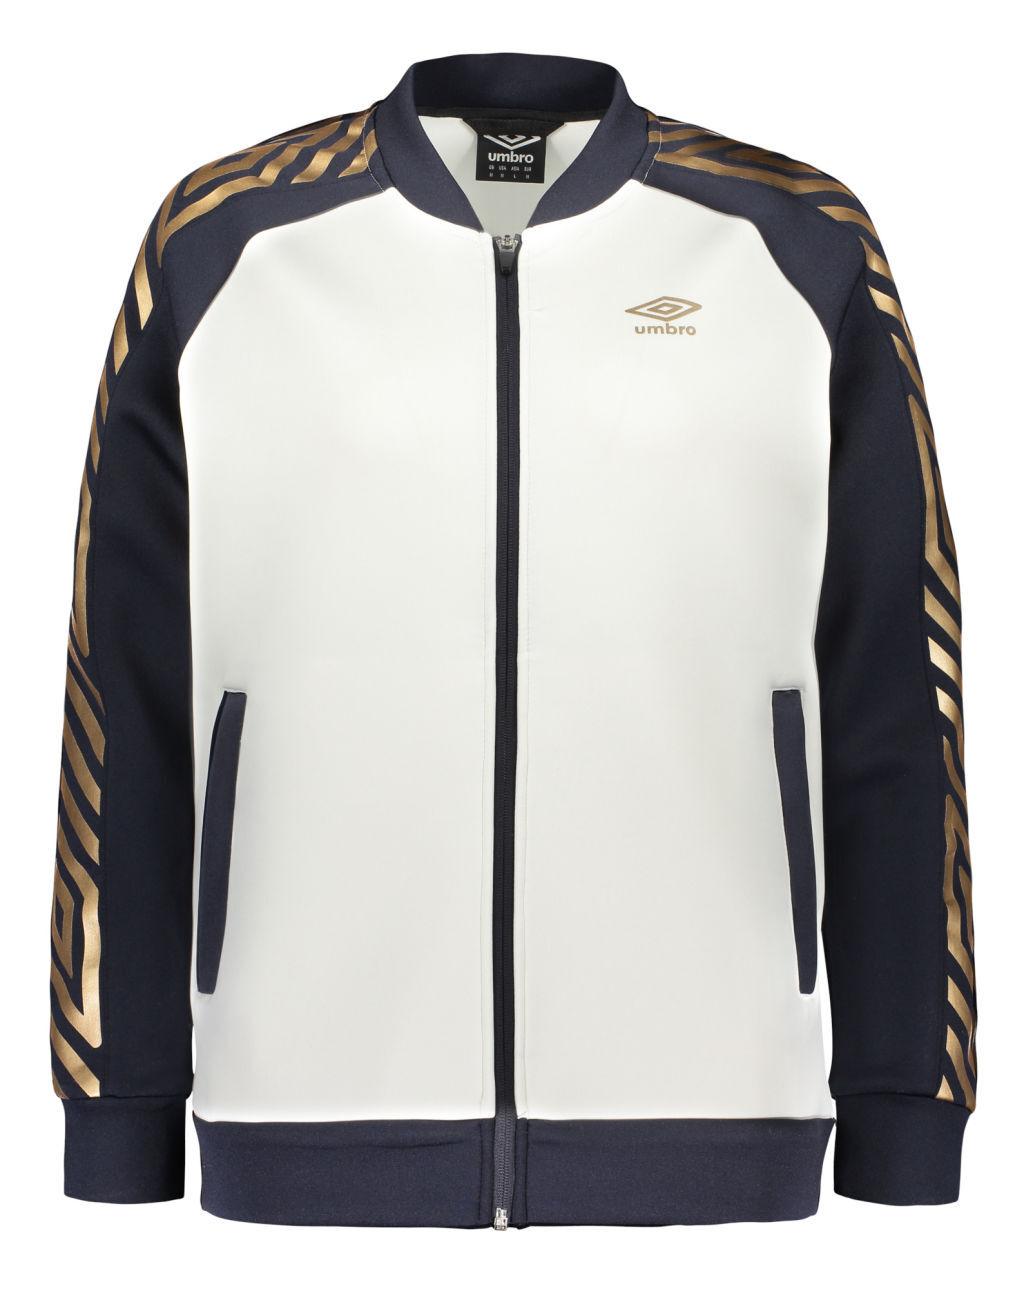 Umbro Brandi track jacket lounge w